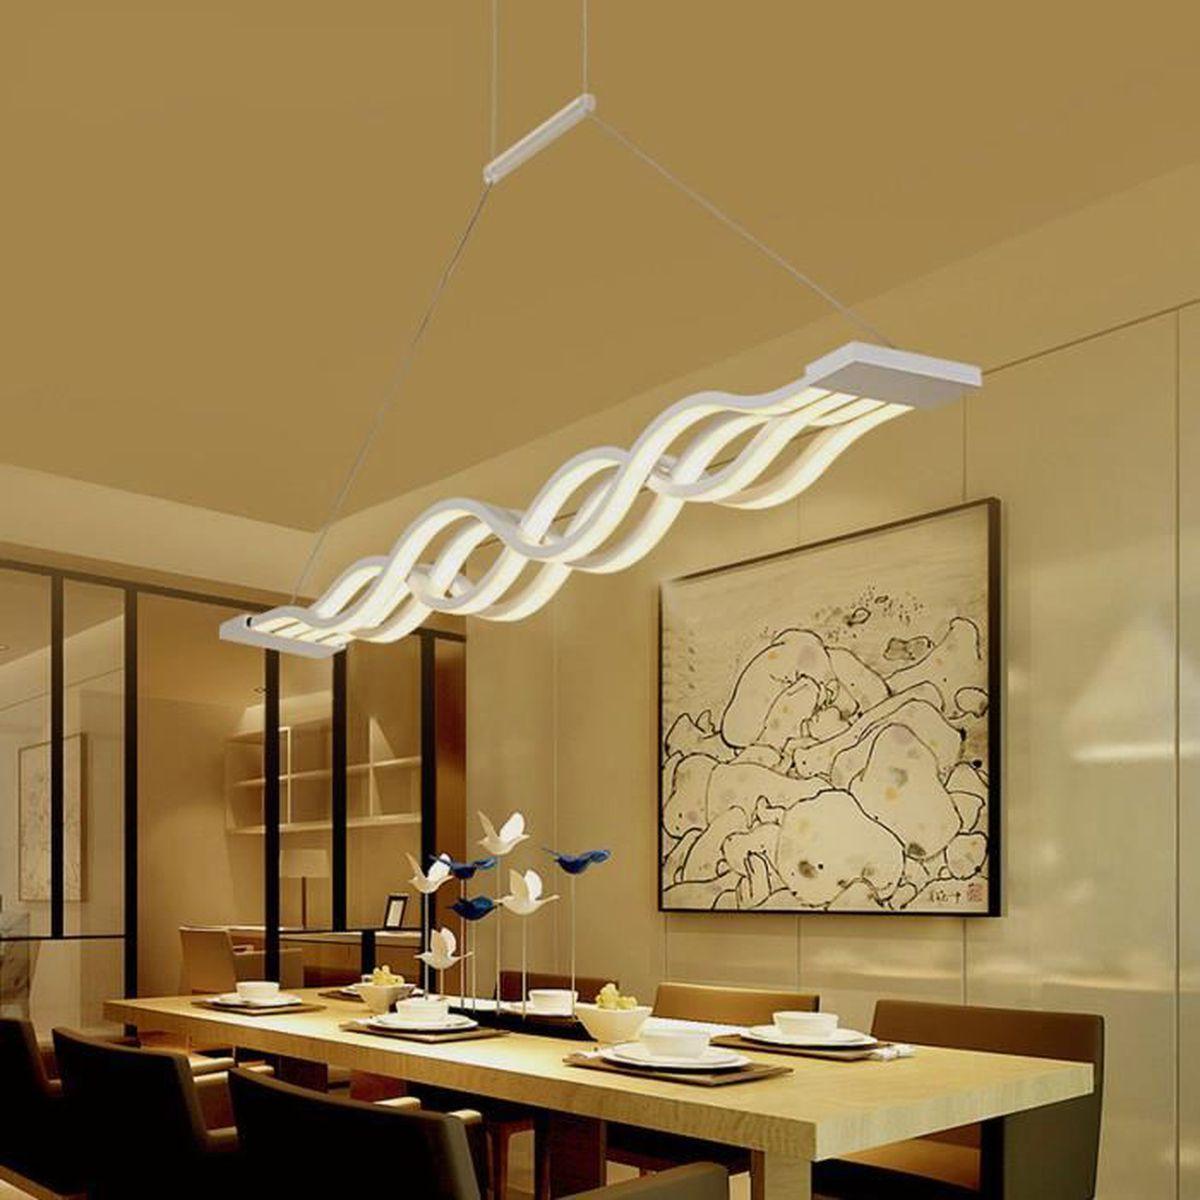 Luminaire Salle A Manger Tendance 2017 lustre moderne salle a manger